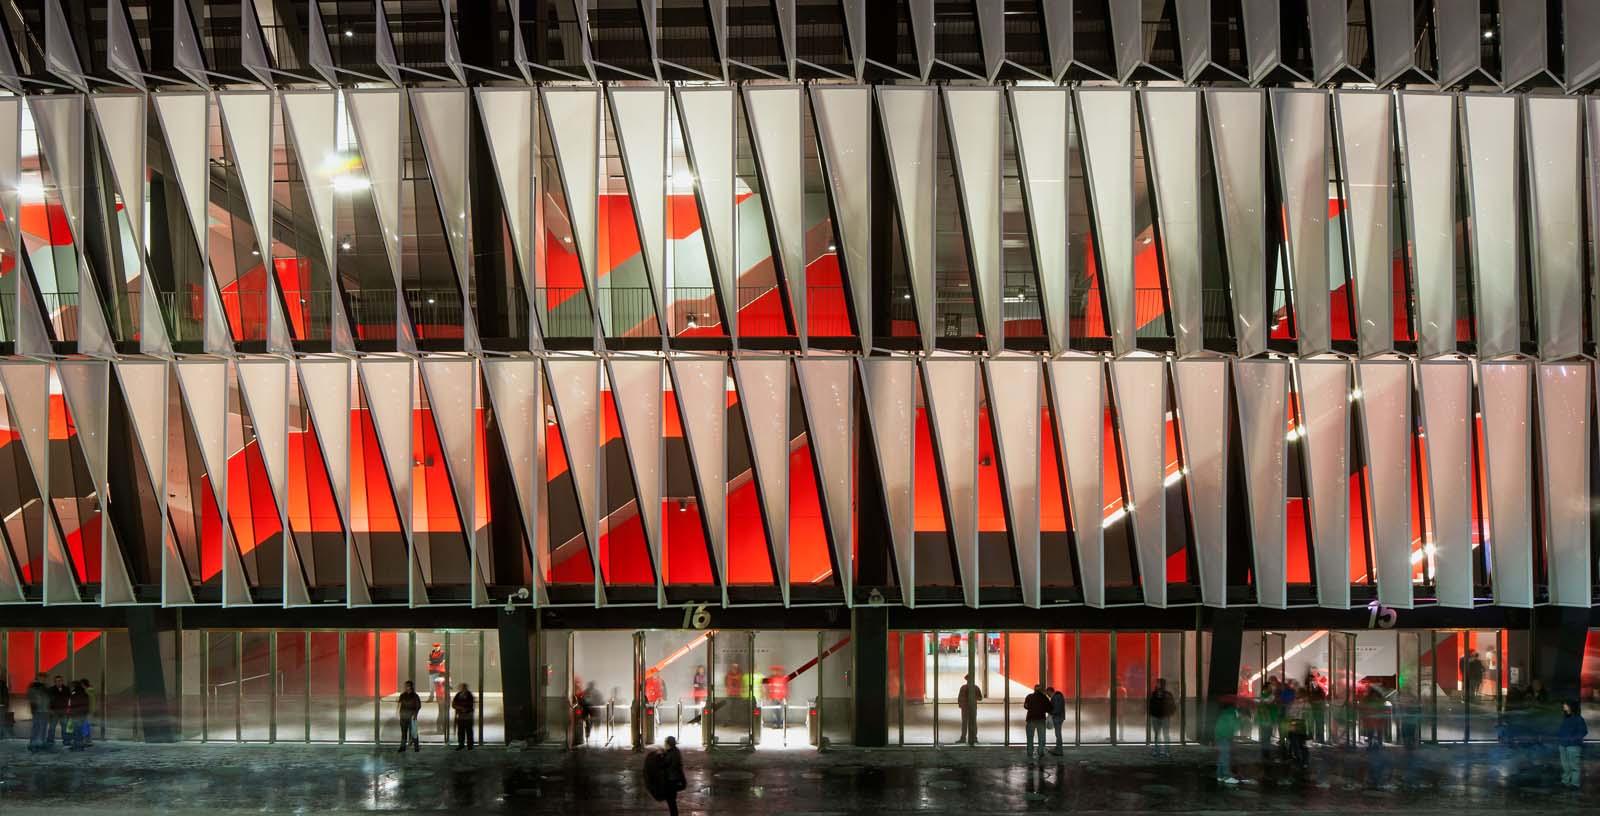 San_Mames_Stadium_02_Architecture_IDOM_photo_Aitor_Ortiz